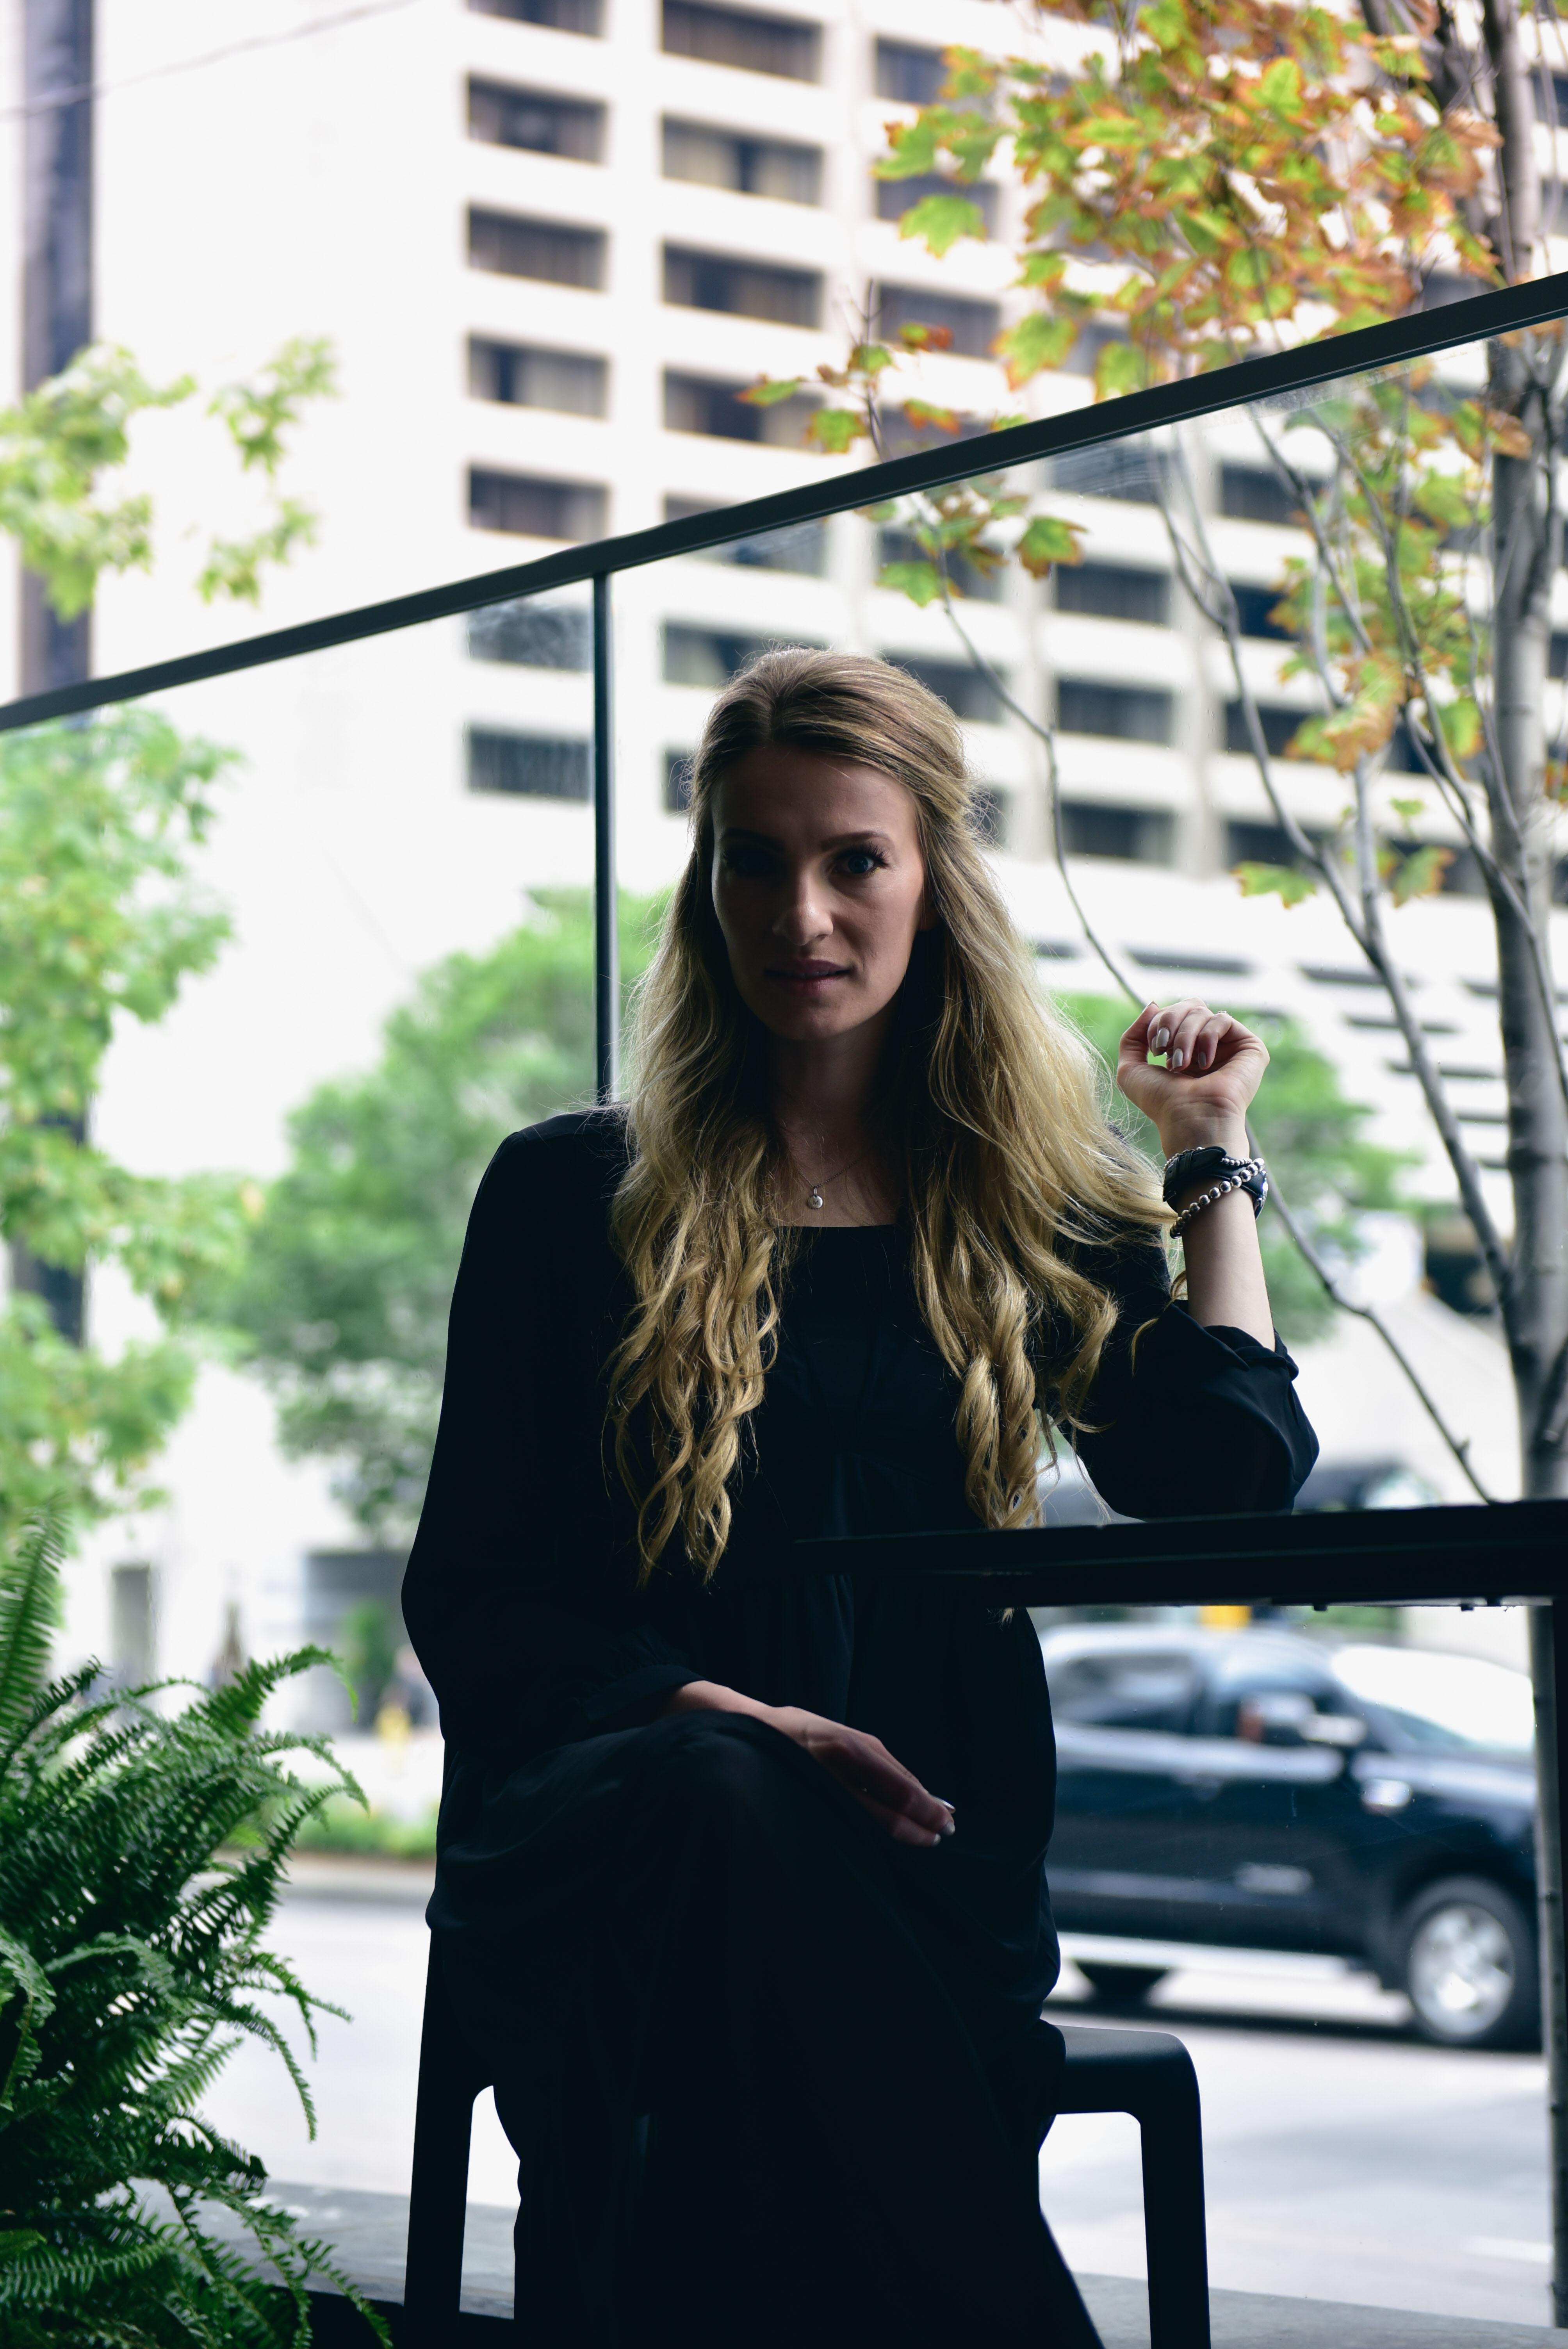 MonMode | Toronto Fashion Blogger | Toronto Blogger | feeling youthful